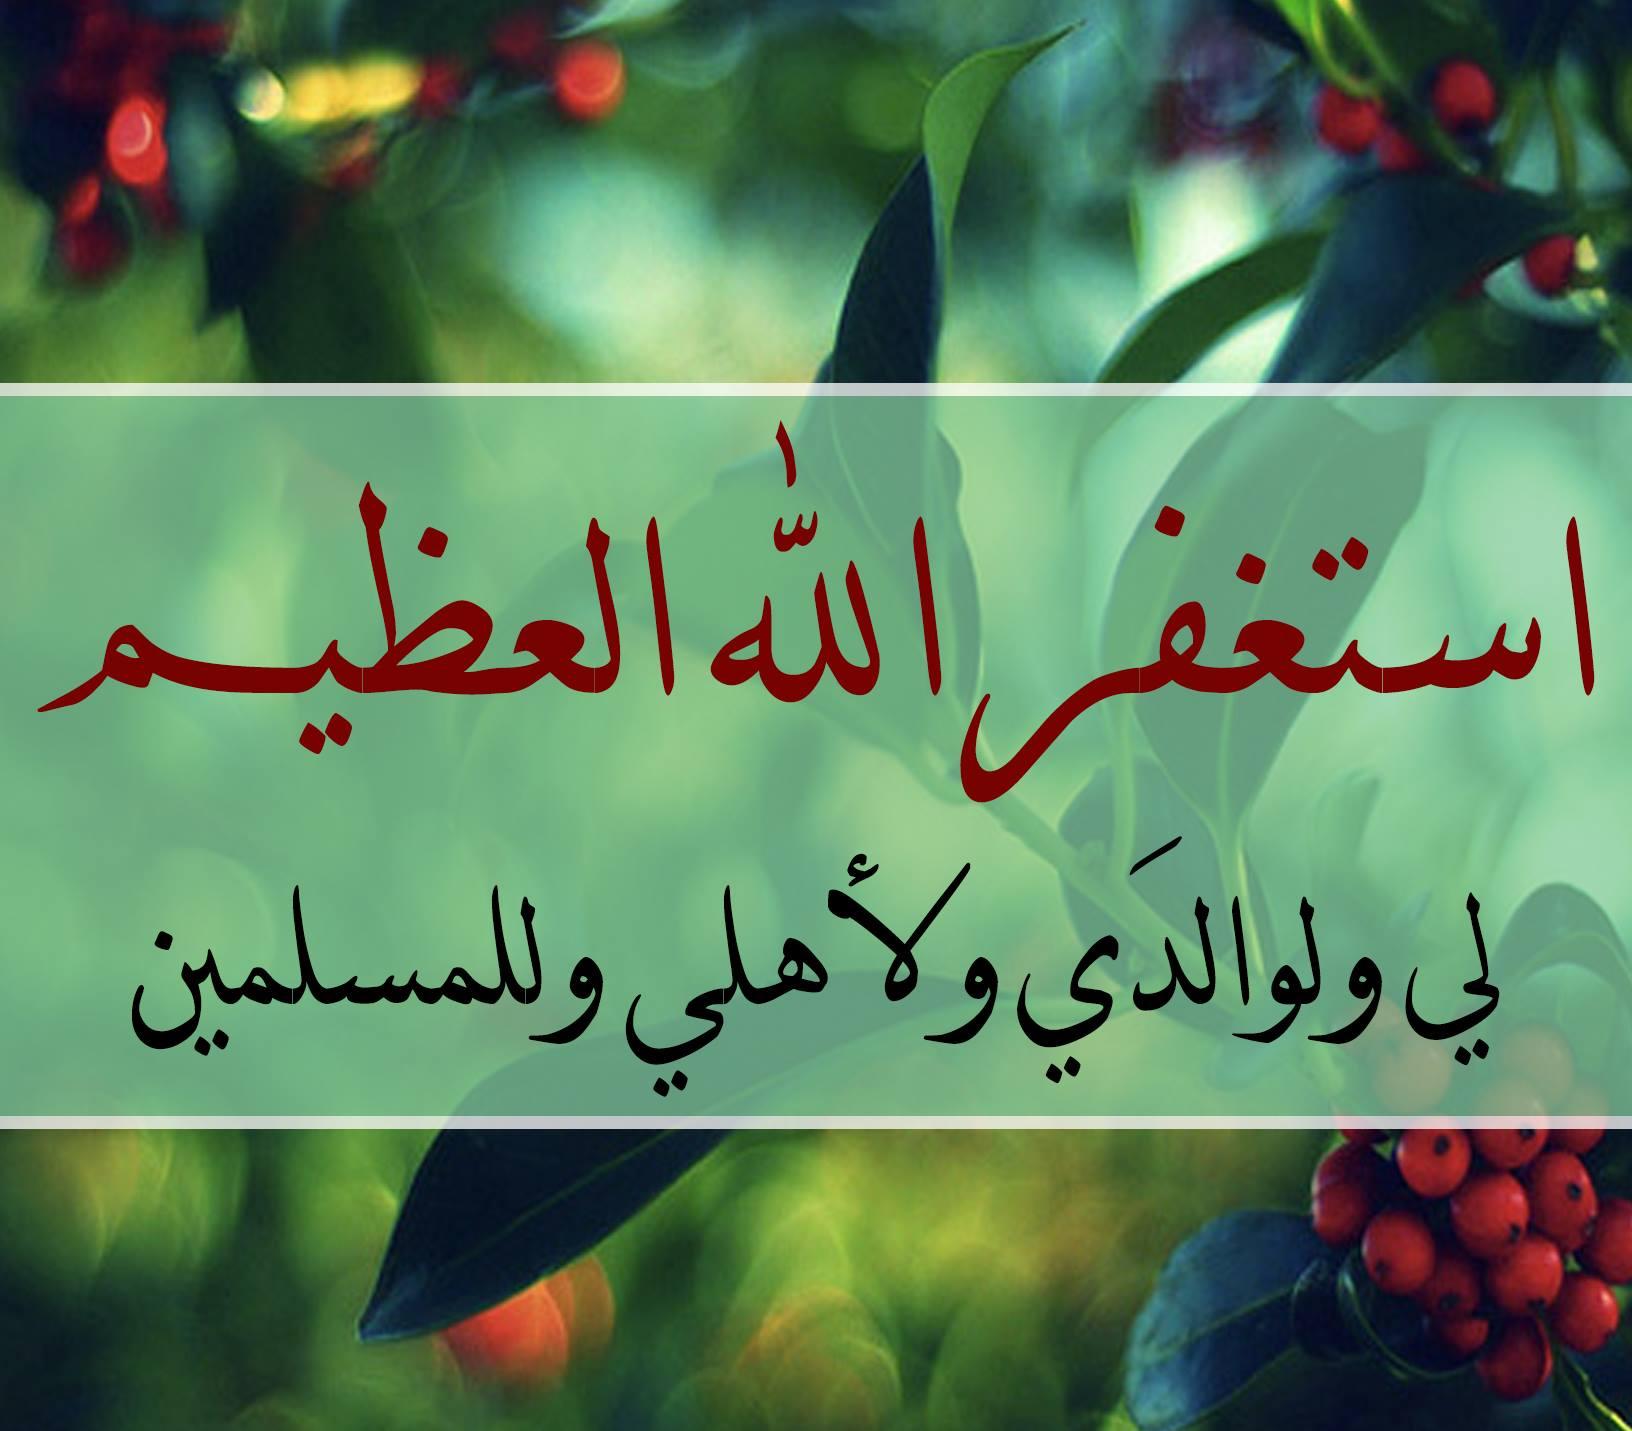 بالصور صور اسلامية , خلفيات اسلاميه 4754 8